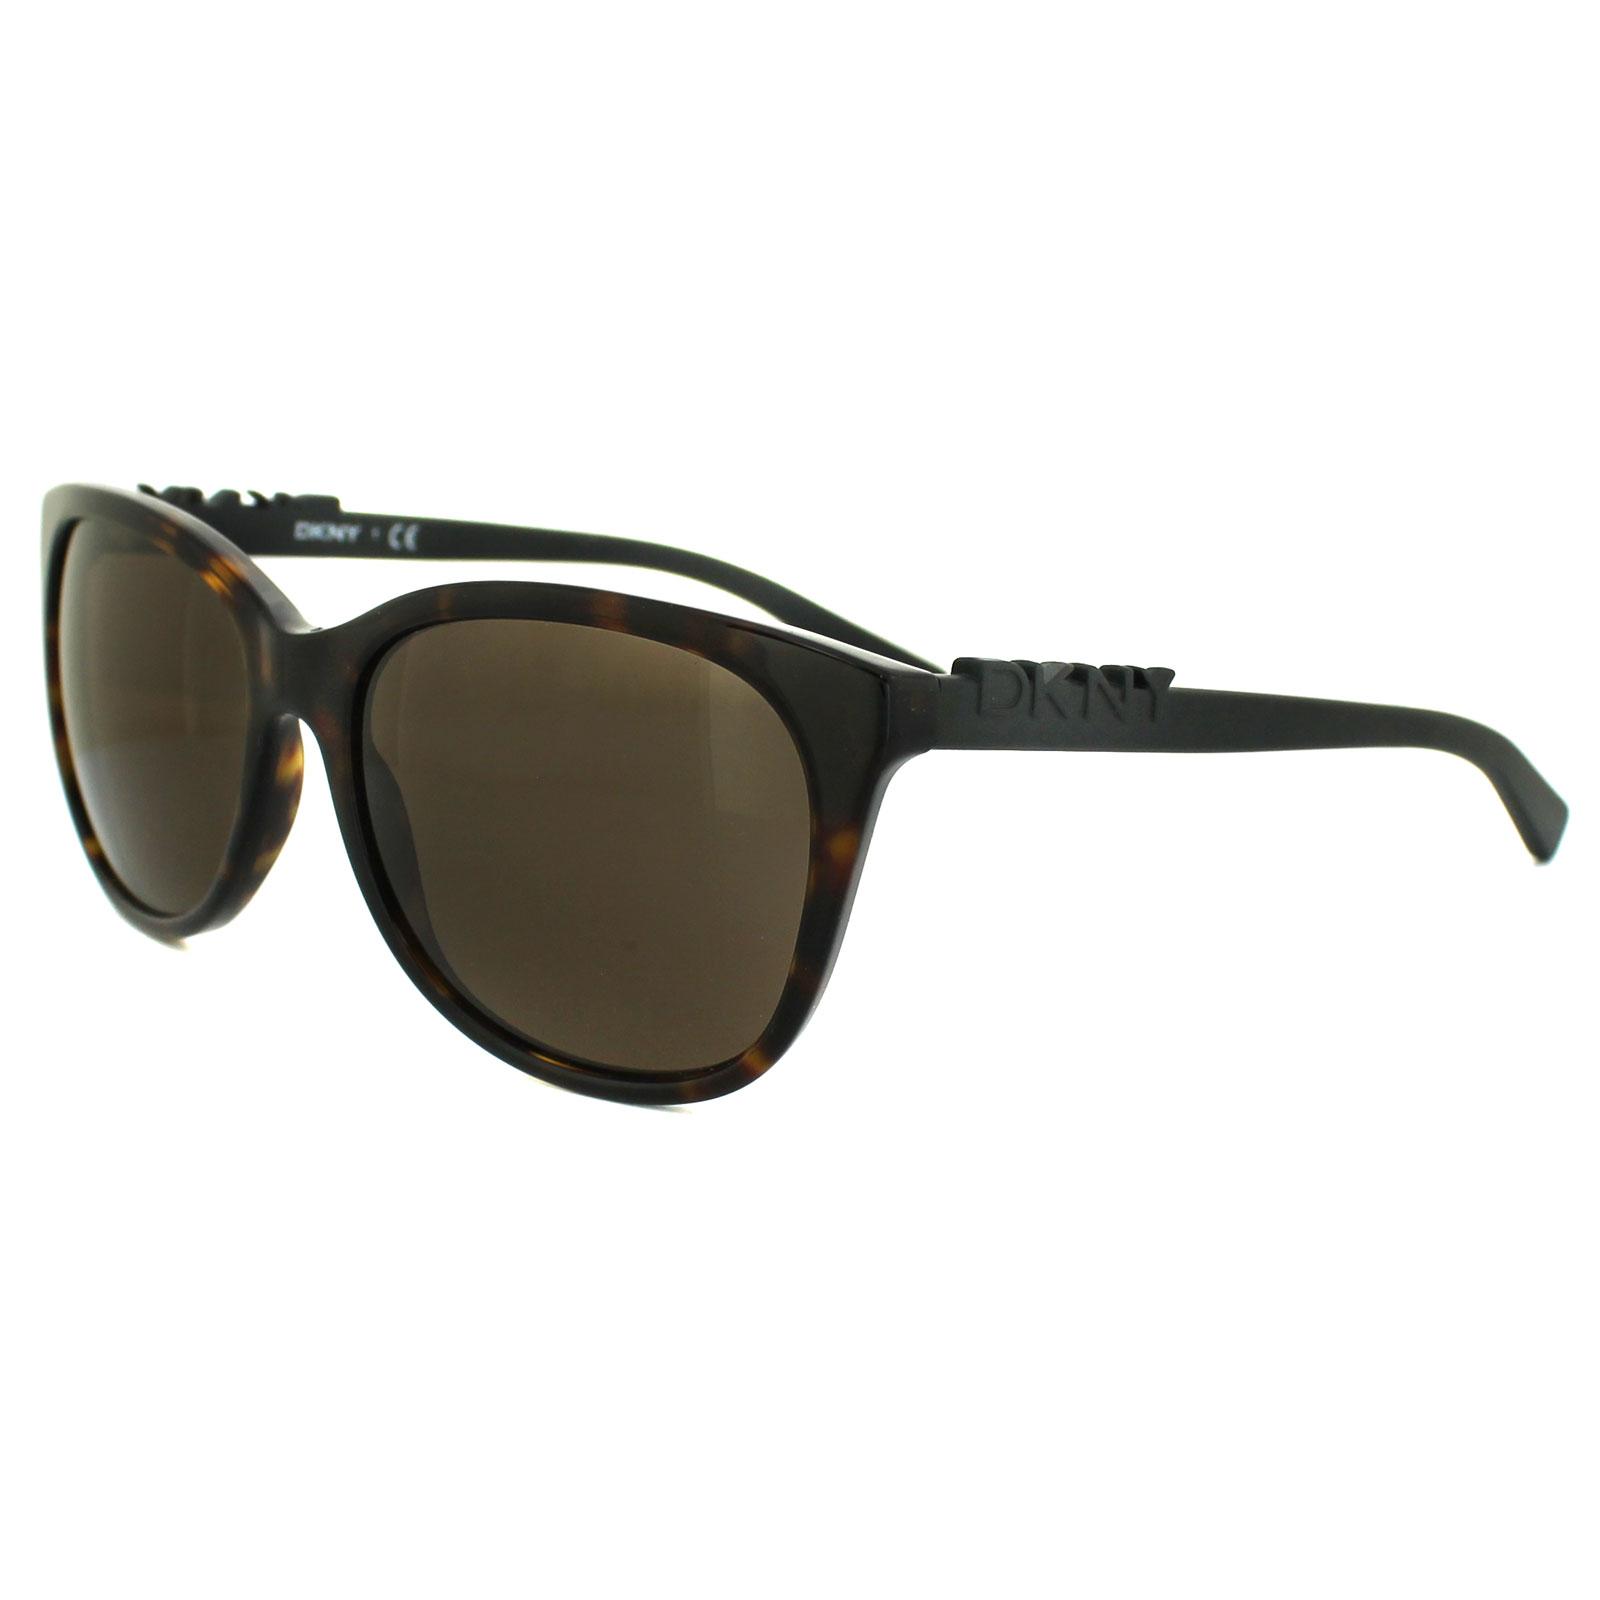 9c697f75579b Cheap DKNY 4126 Sunglasses - Discounted Sunglasses